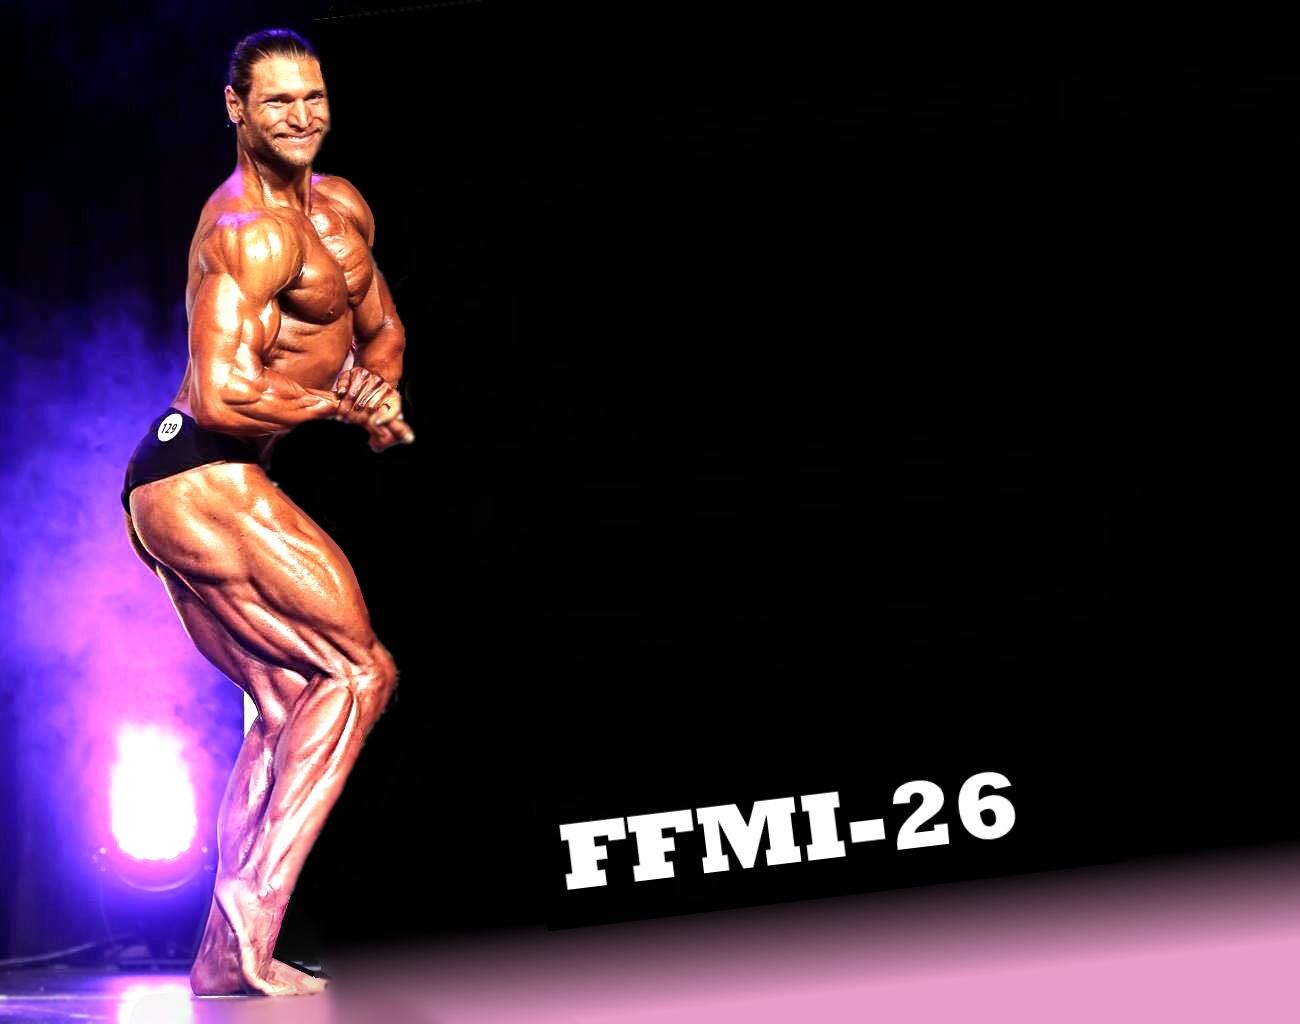 FFMI 26.